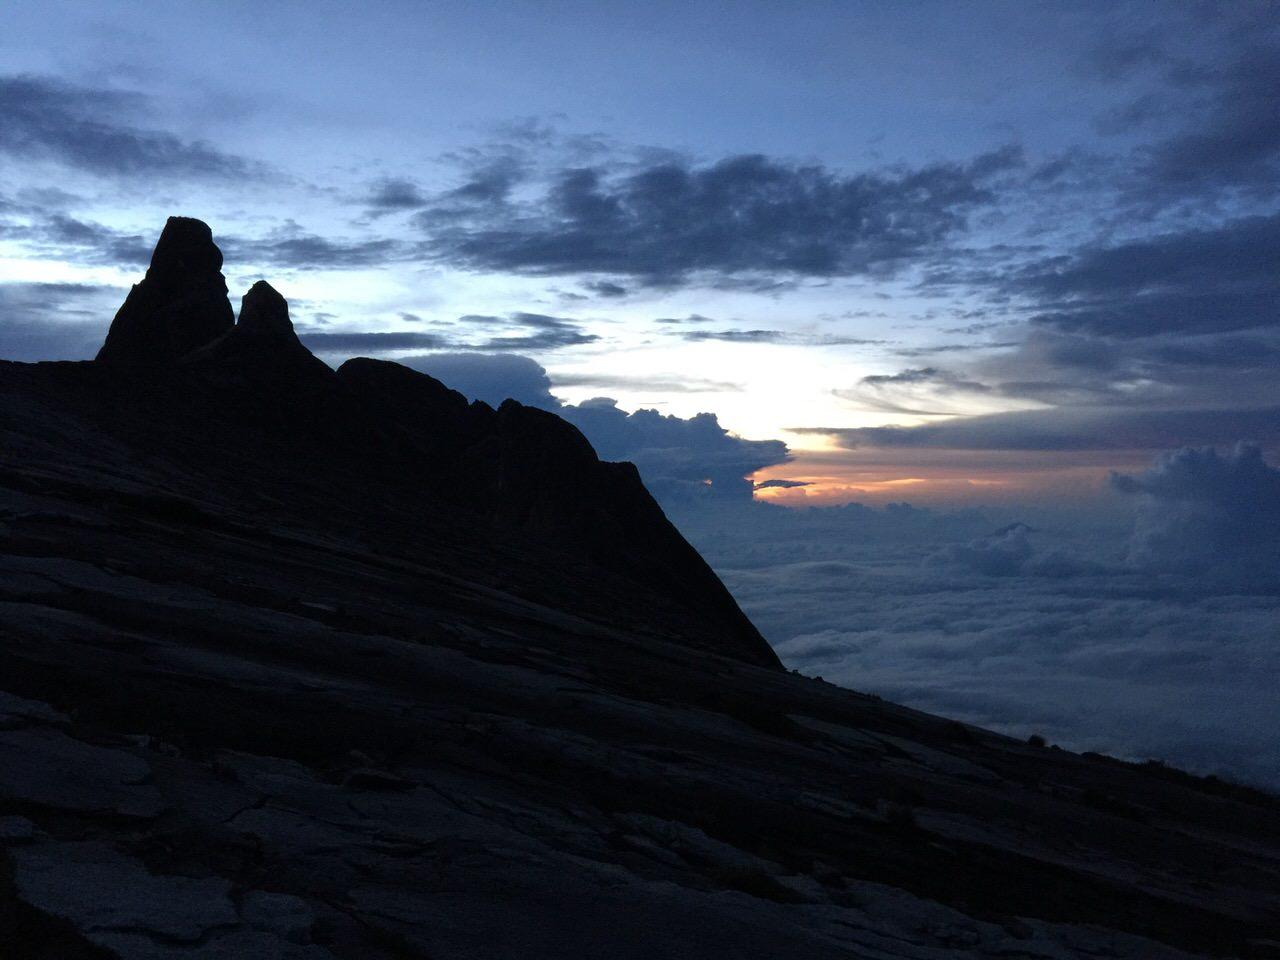 Kota Kinabalu climbing 4147